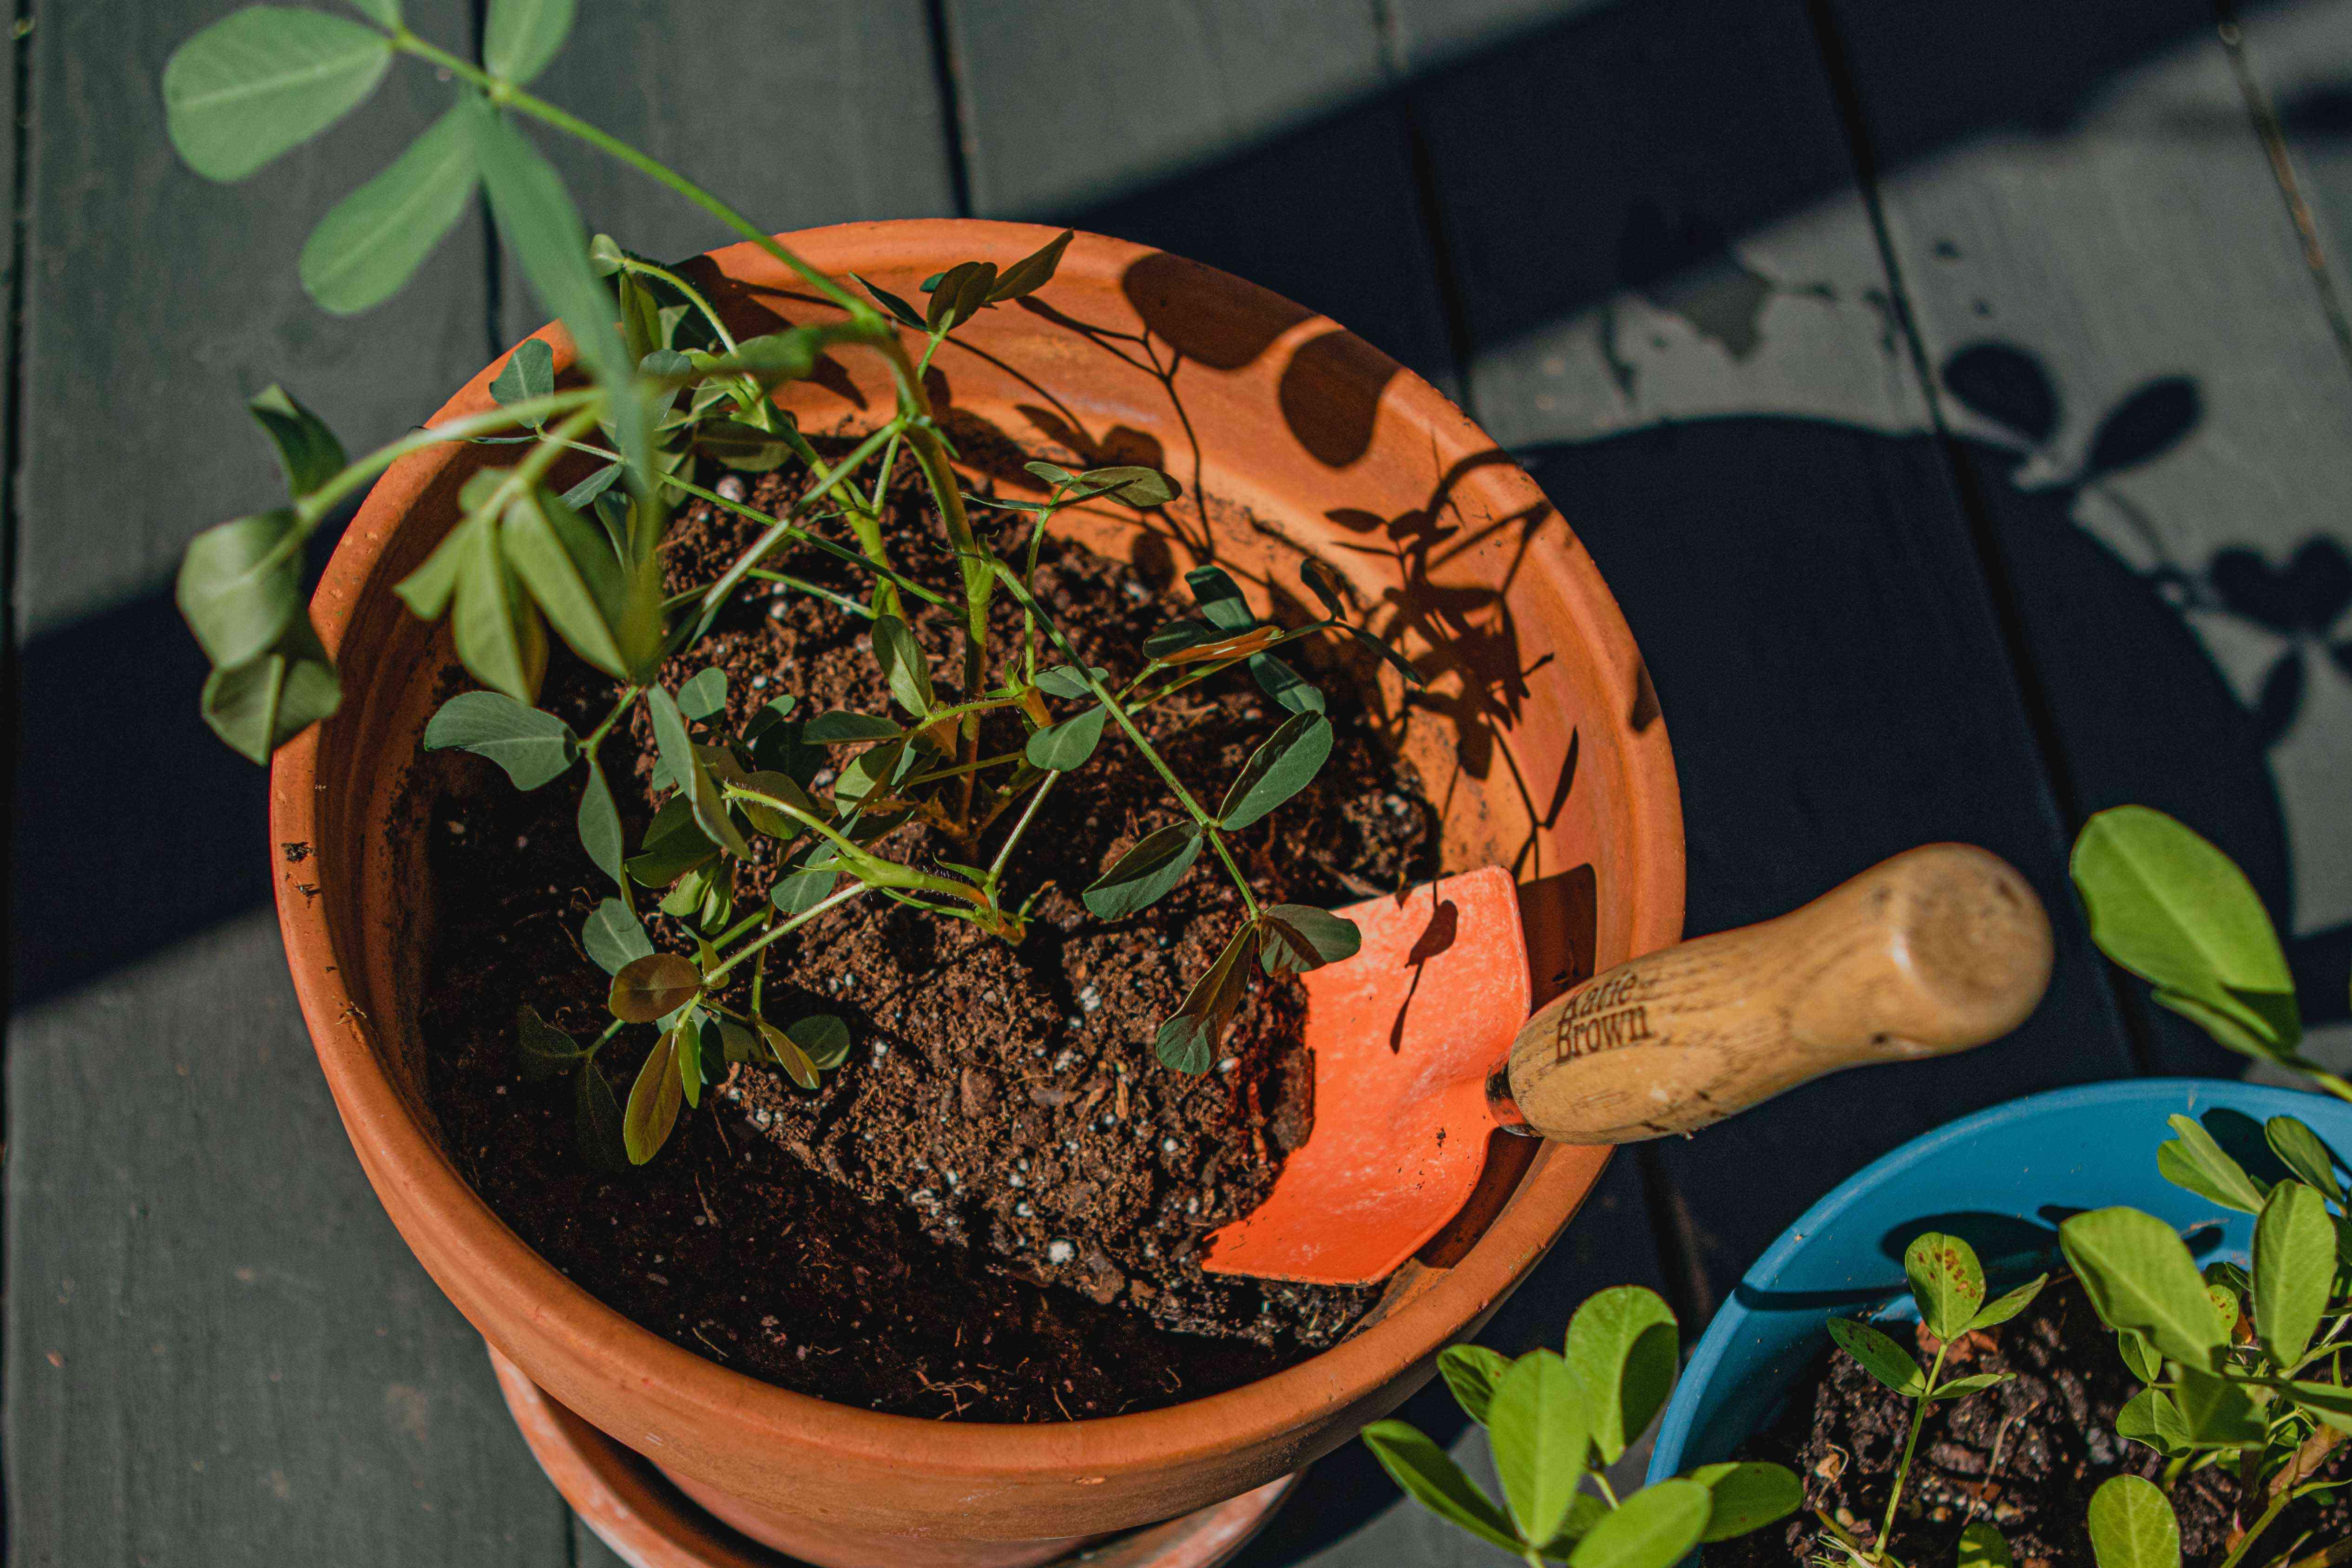 peanut starter plant in terracotta pot with garden trowel